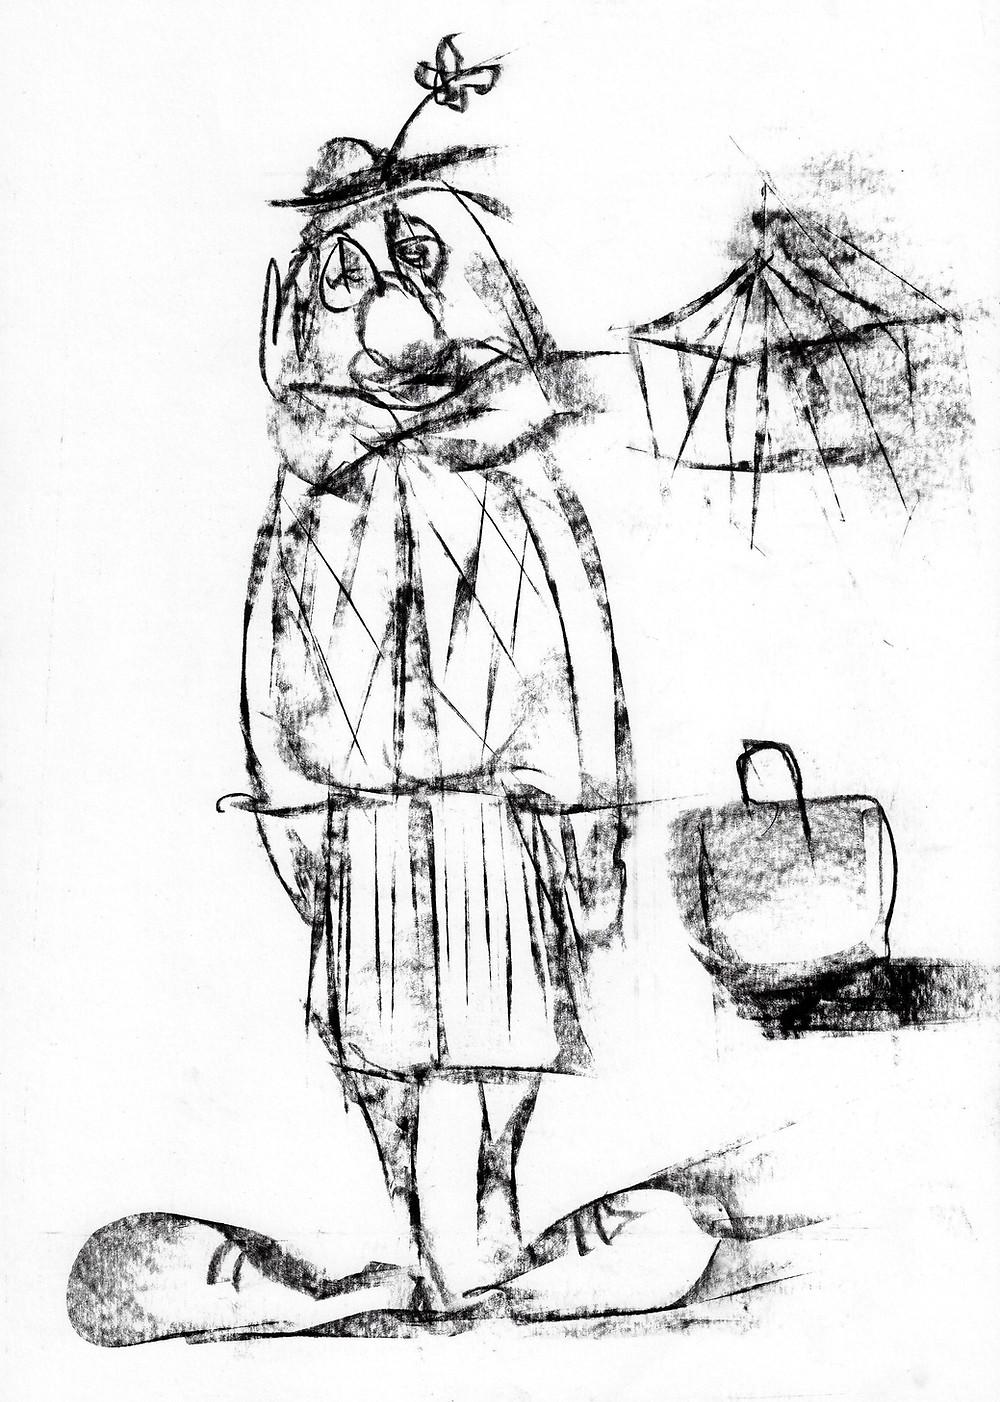 Original charcoal drawing.